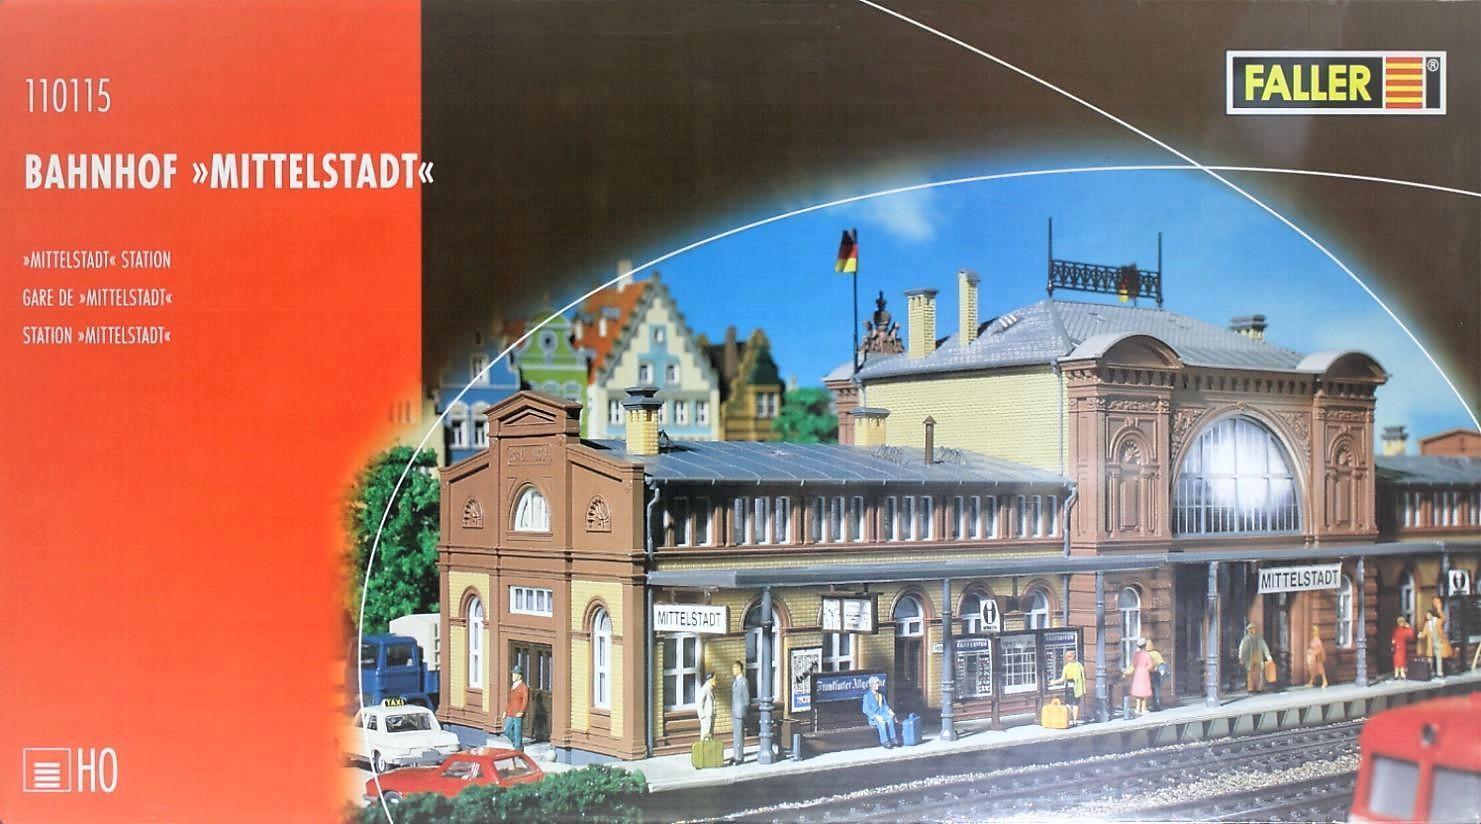 Faller 110115 H0 - Bahnhof   Mittelstadt   NEU & OvP  | Billig